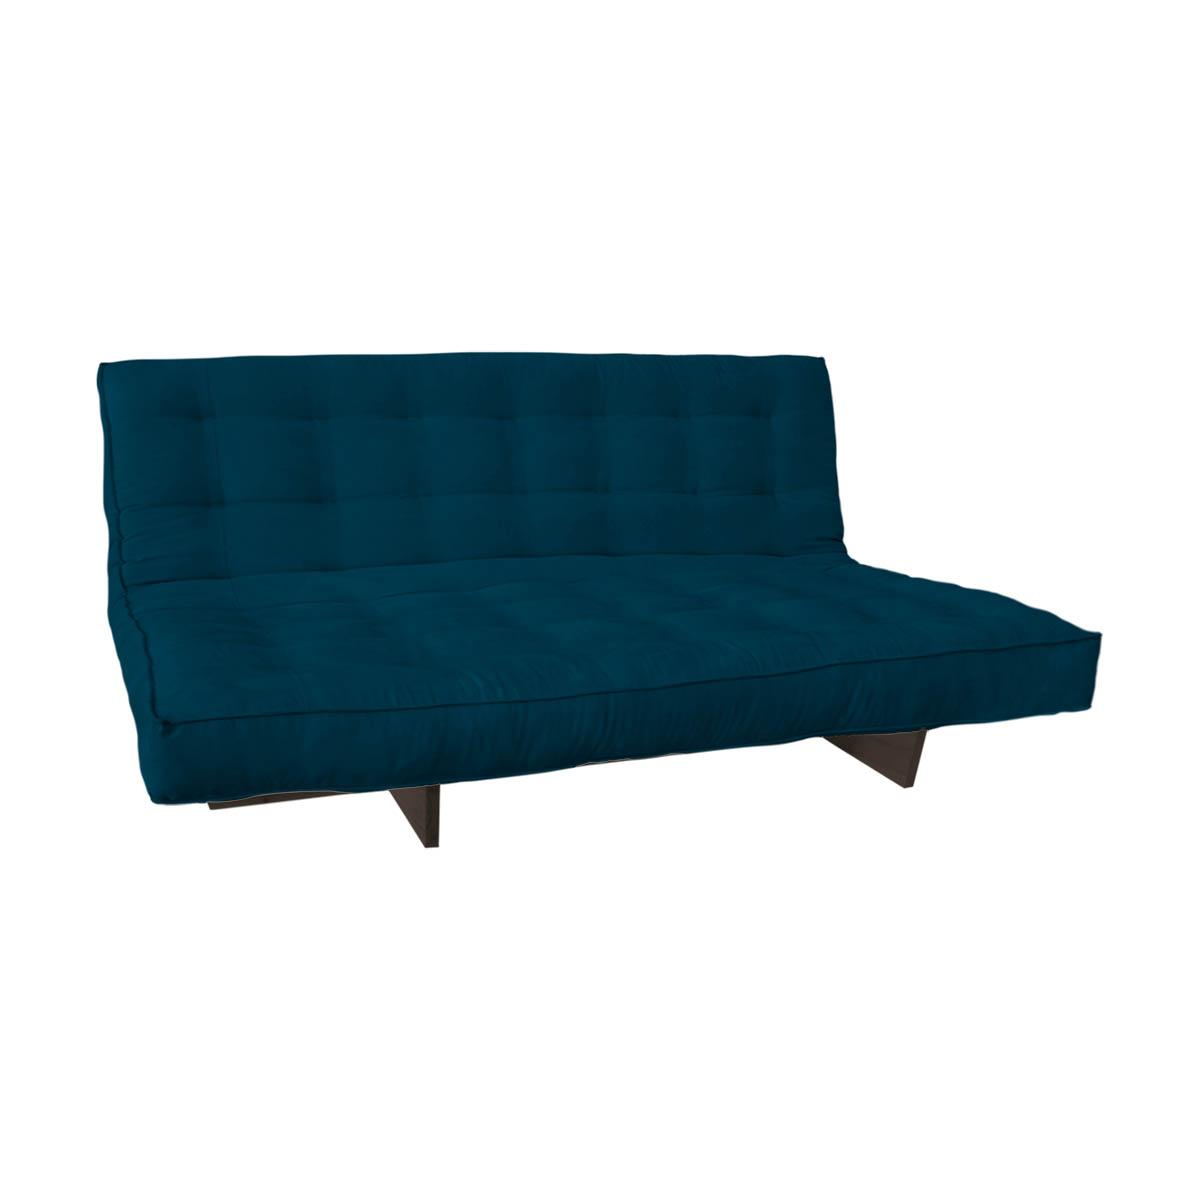 Sofa Chaise Futon Company